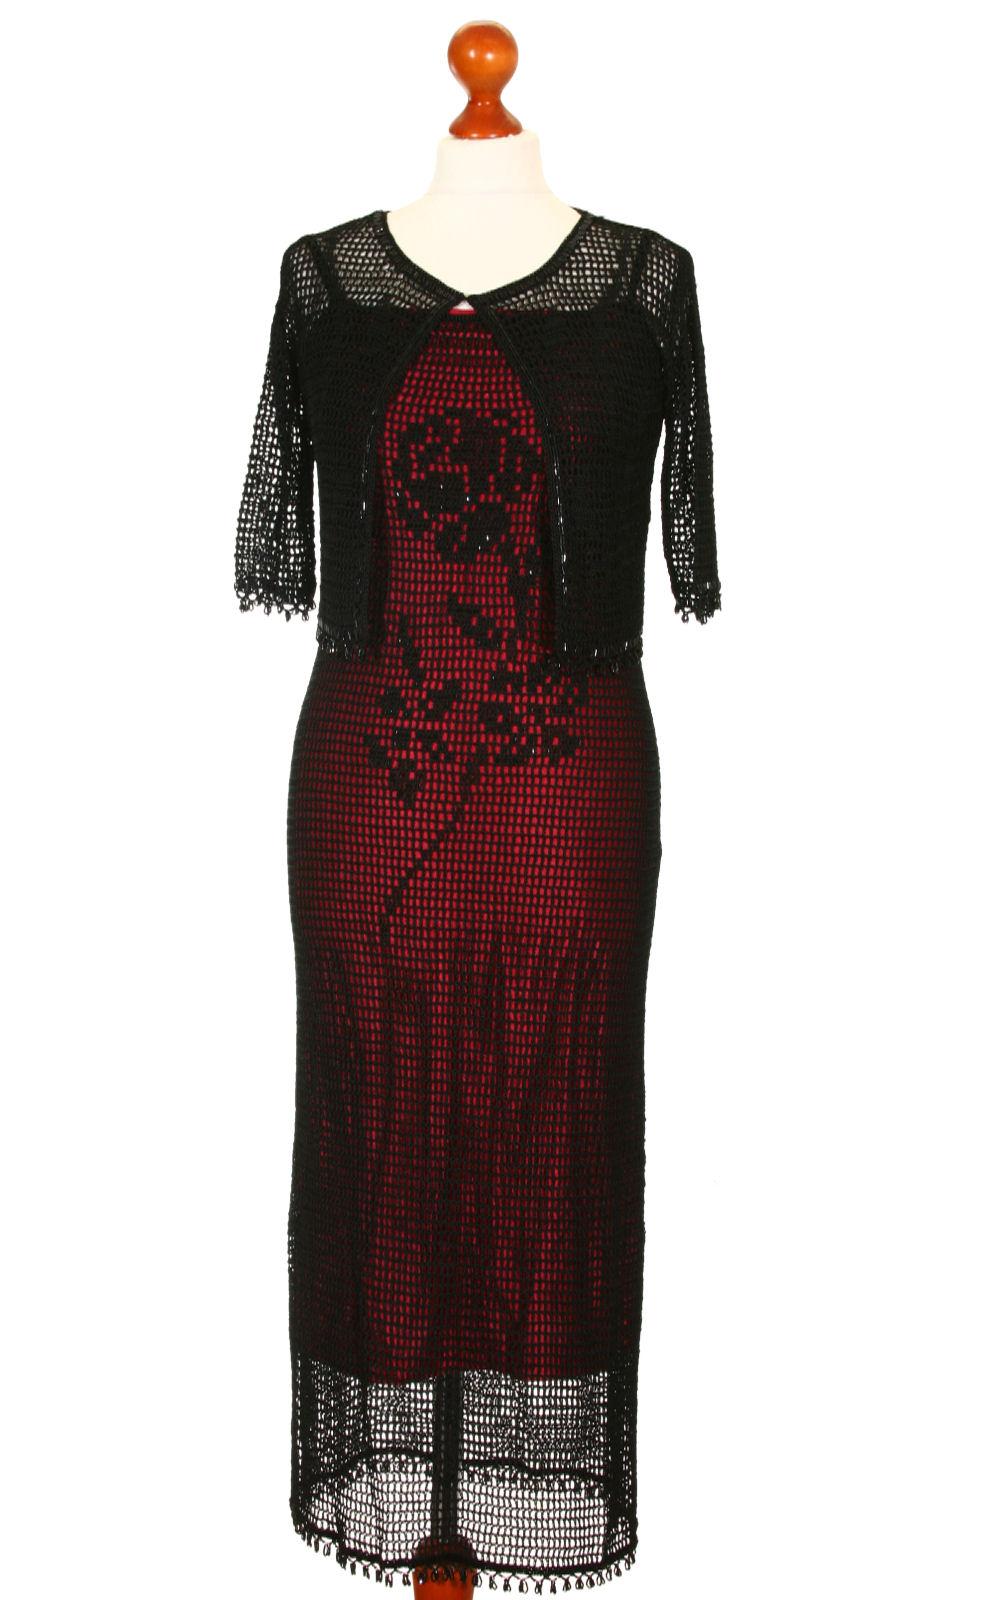 b7be494c1f6e Női ruházat | Alkalmi ruha, MNG, Méret: M | http://www.ruhavadasz.hu/